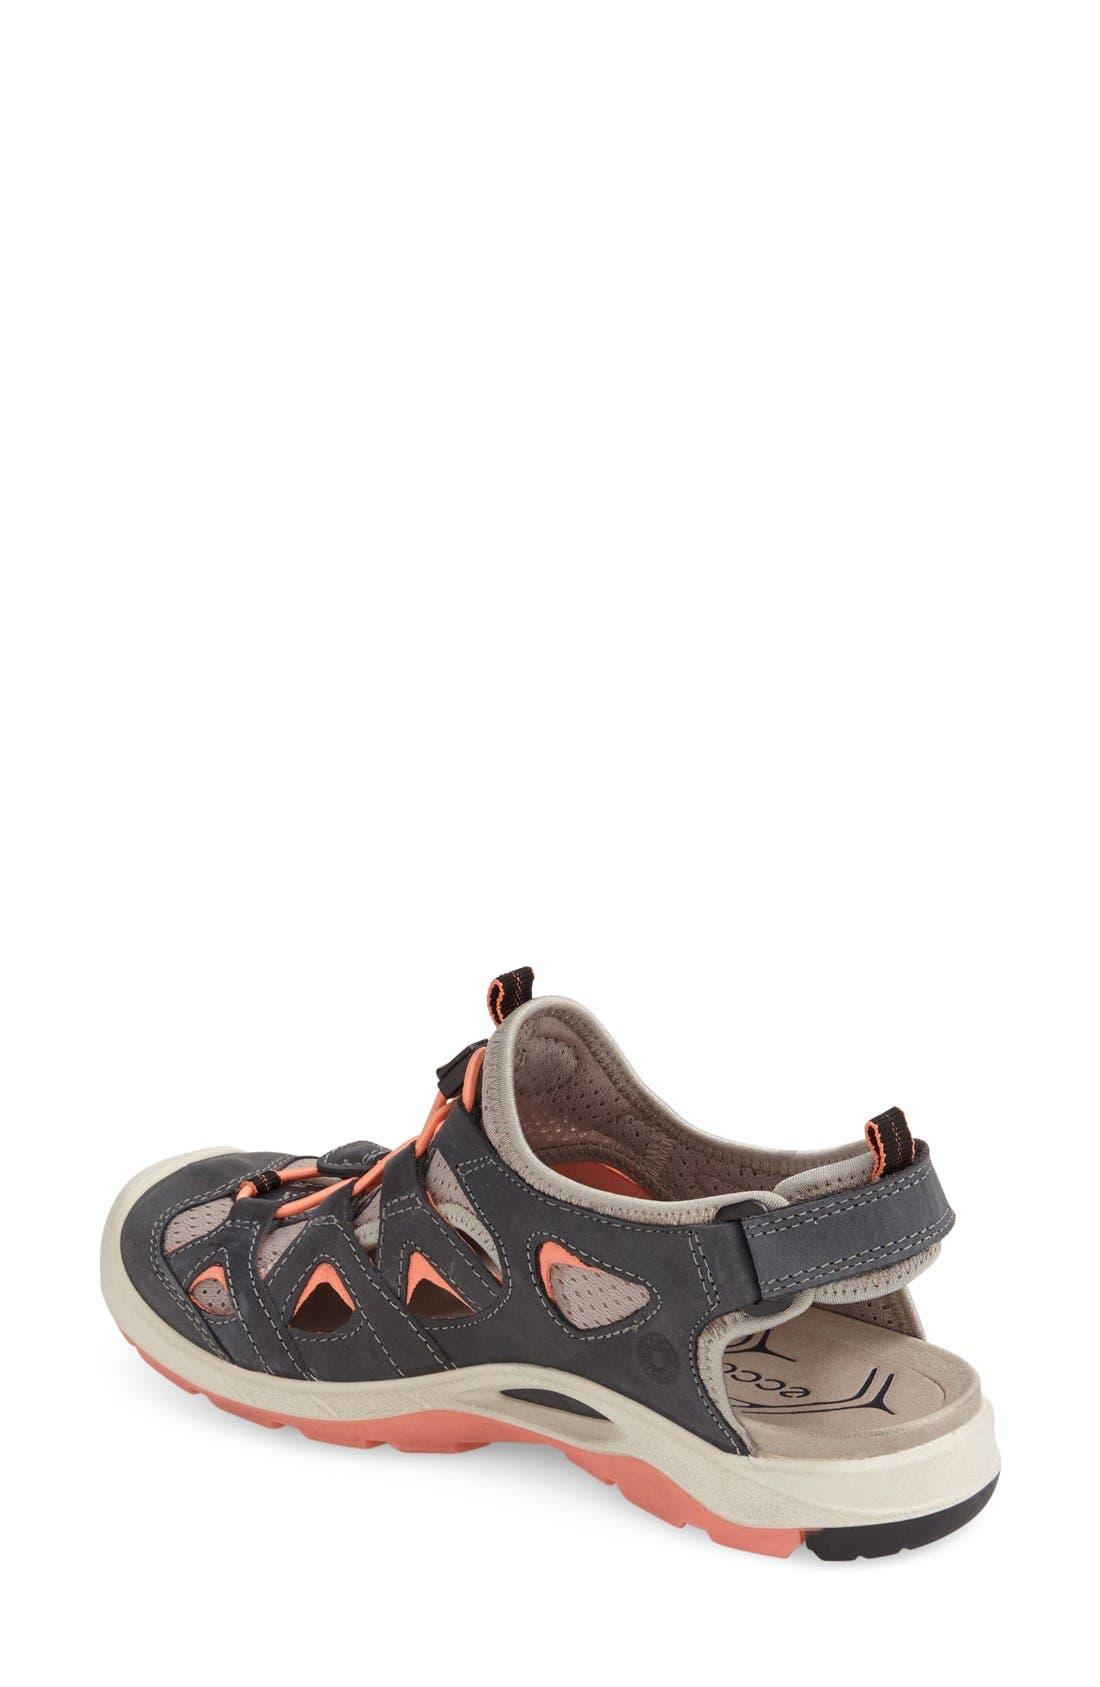 'Biom Delta Offroad' Sneaker,                             Alternate thumbnail 2, color,                             400